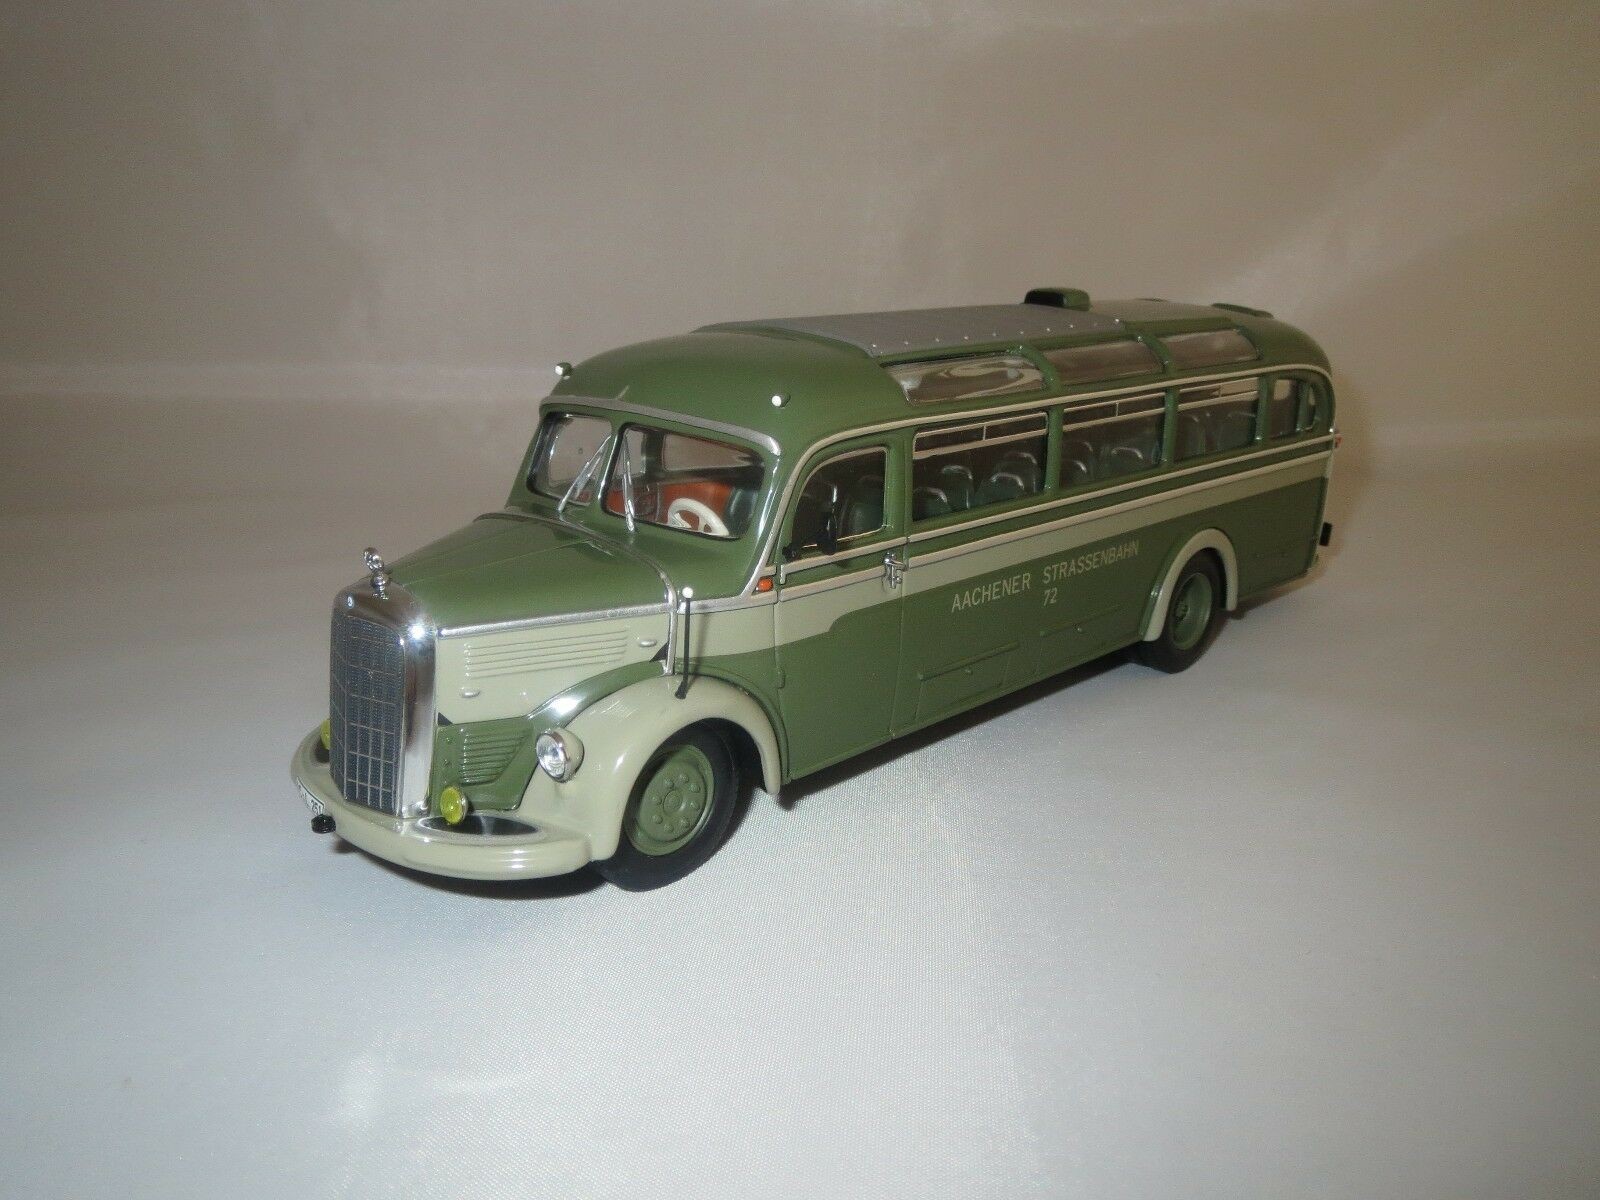 MINICHAMPS Mercedes-Benz O 3500 (Aachener tramways) 1 43 neuf dans sa boîte